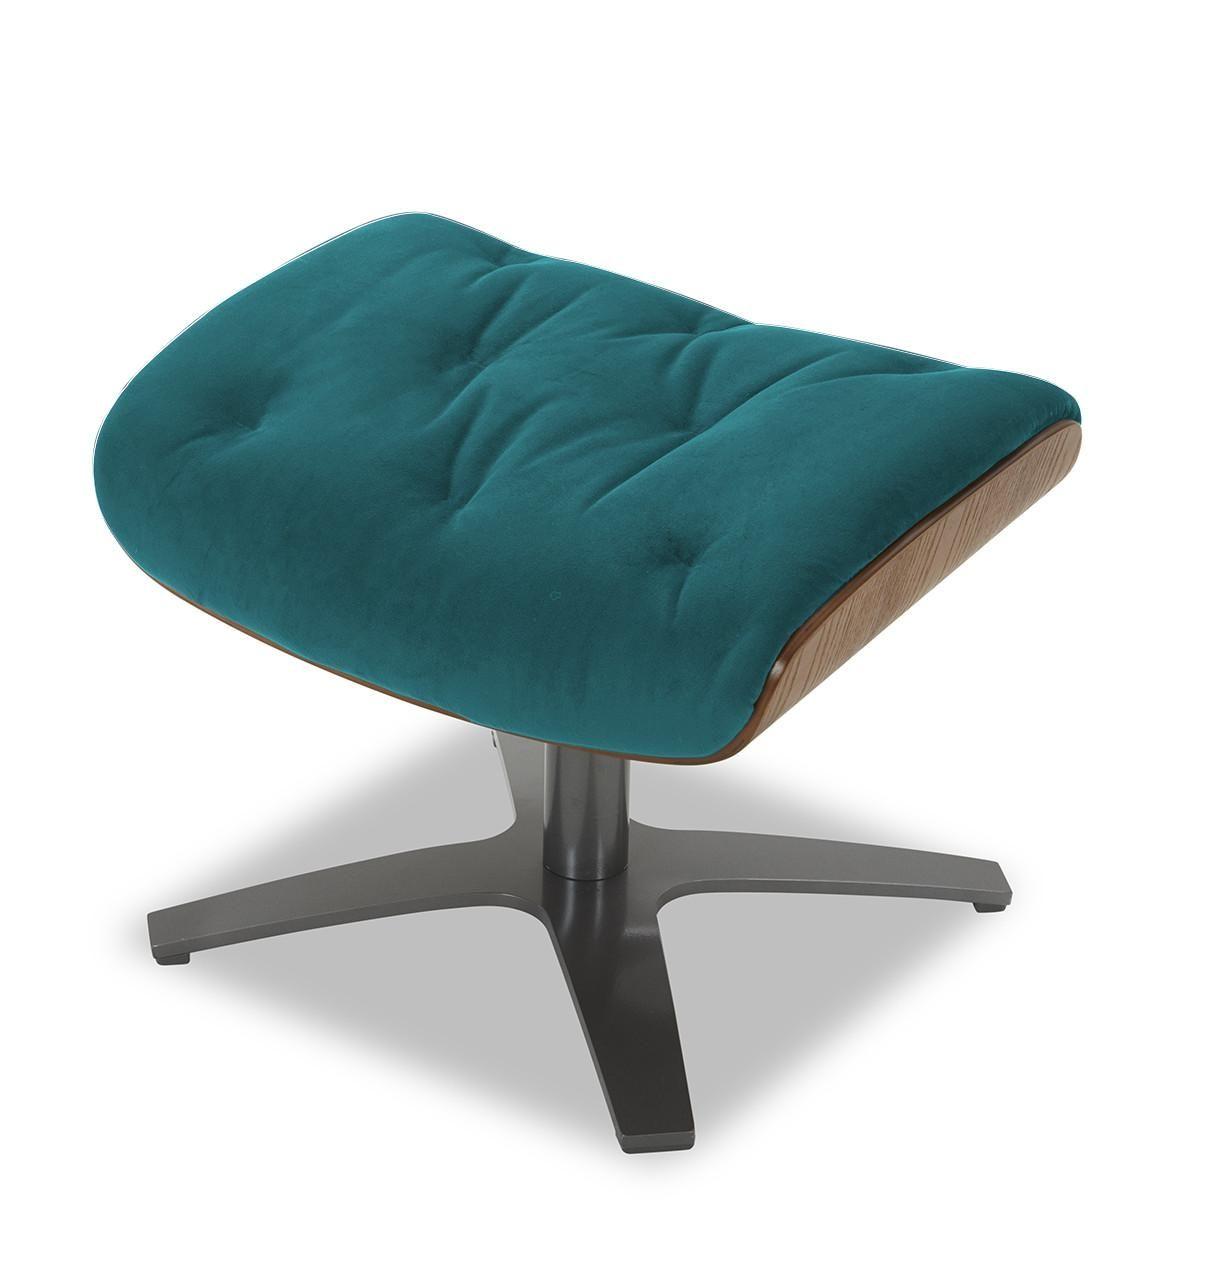 Repose-pieds de relaxation velours bleu-vert et chêne naturel